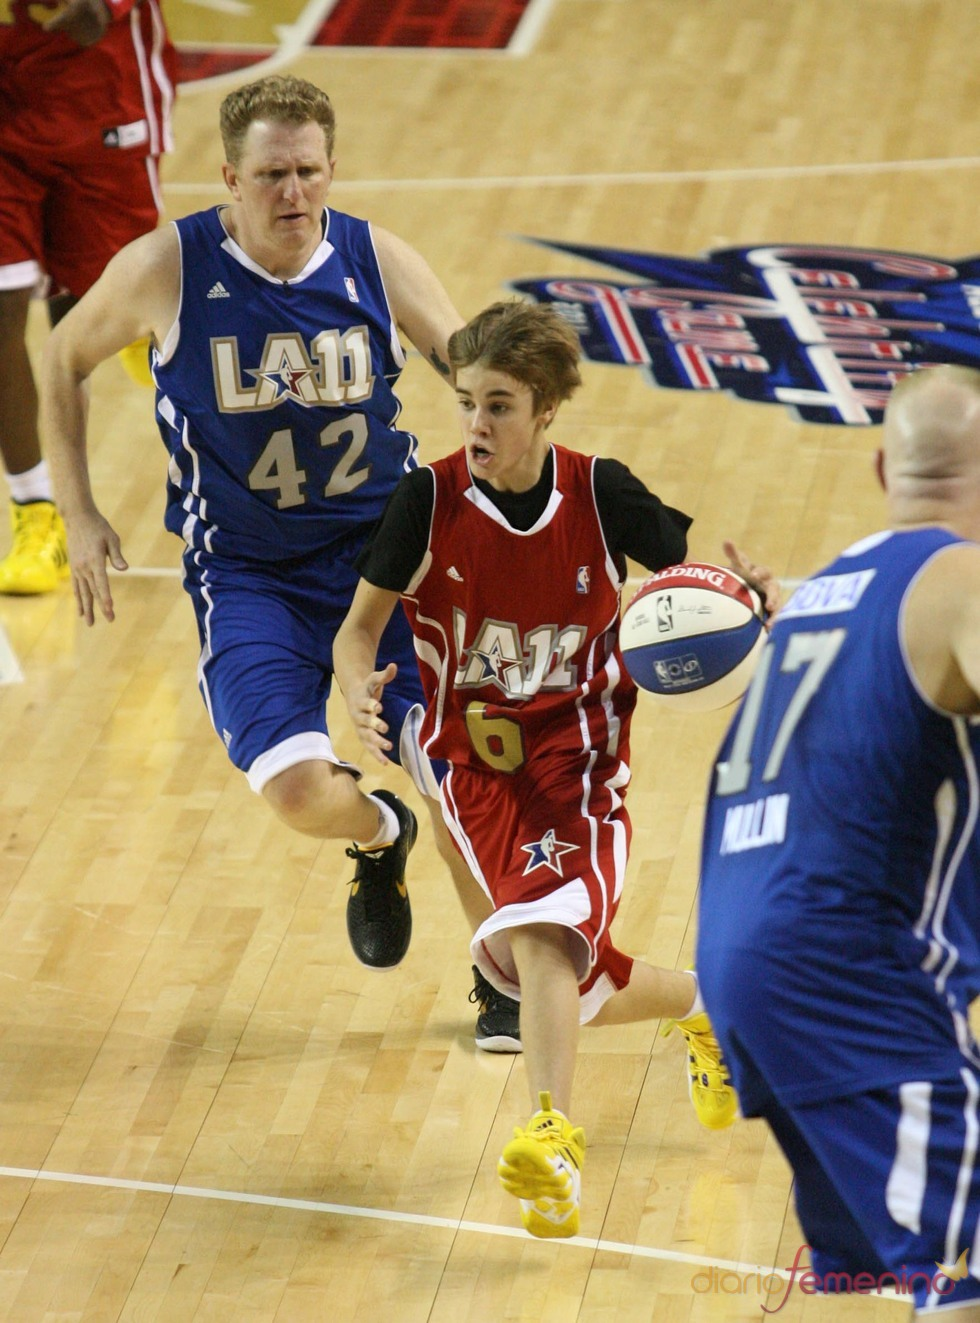 Justin Bieber demuestra ser un 'crack' del baloncesto